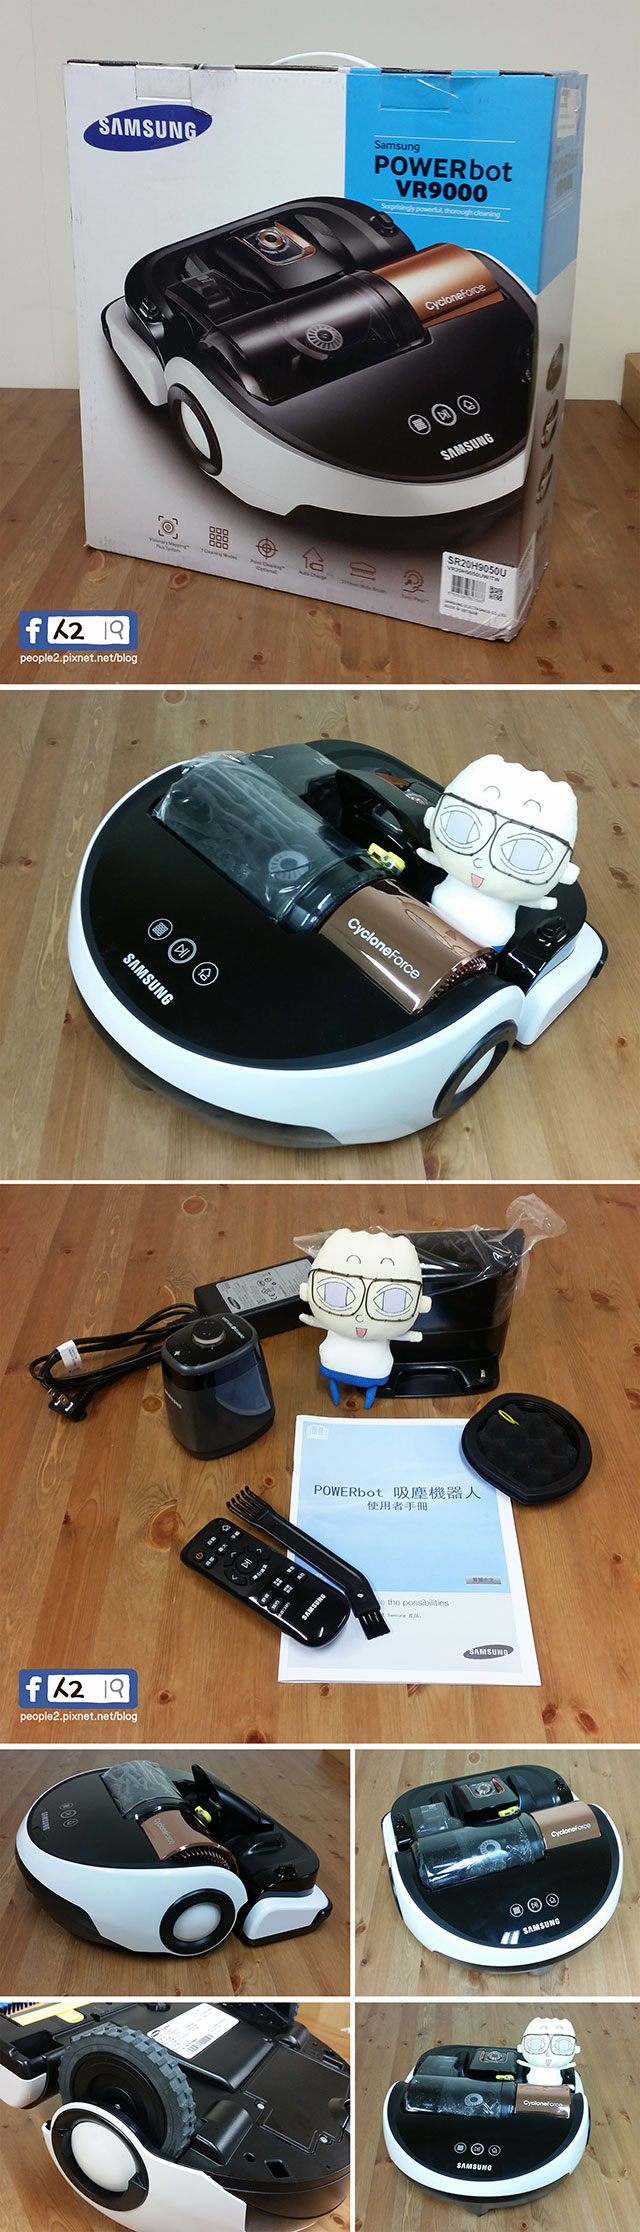 3C SAMSUNGPOWERbot極勁氣旋機器人 SAMSUNG 機器人 打掃 吸力 人2 人2的插画星球 People2 people2planet 徵女友